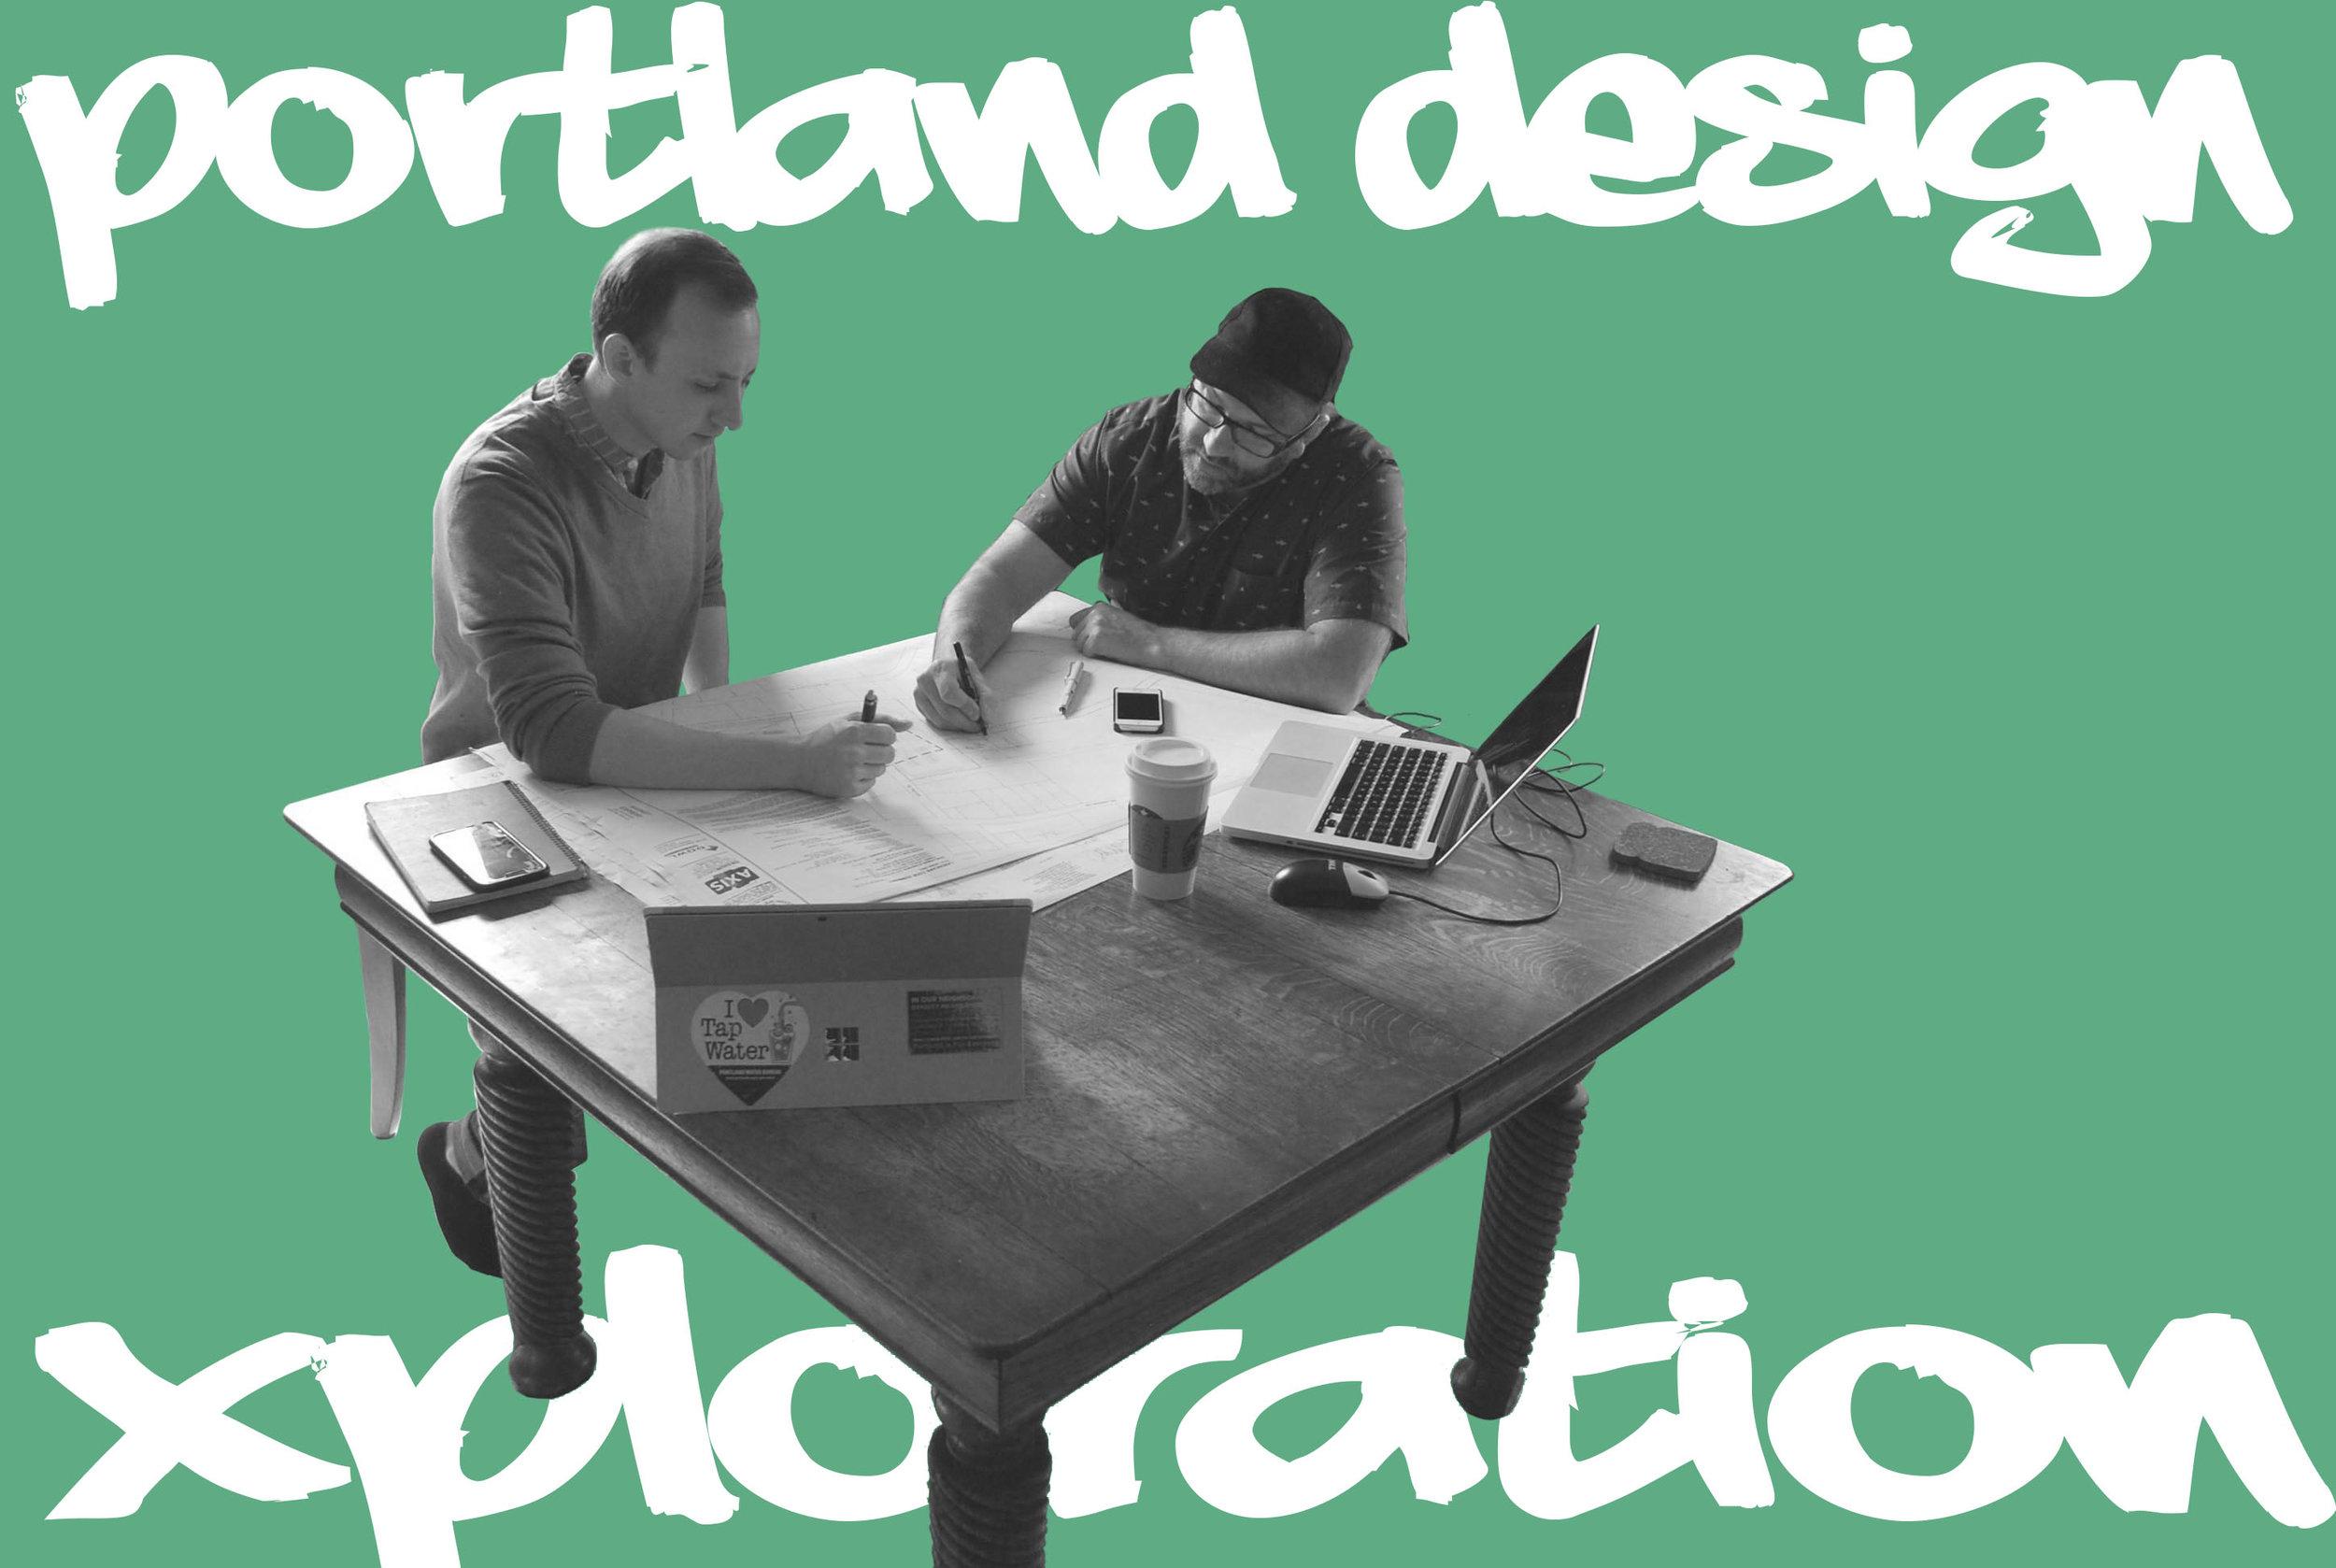 Design Xploration 2.jpg